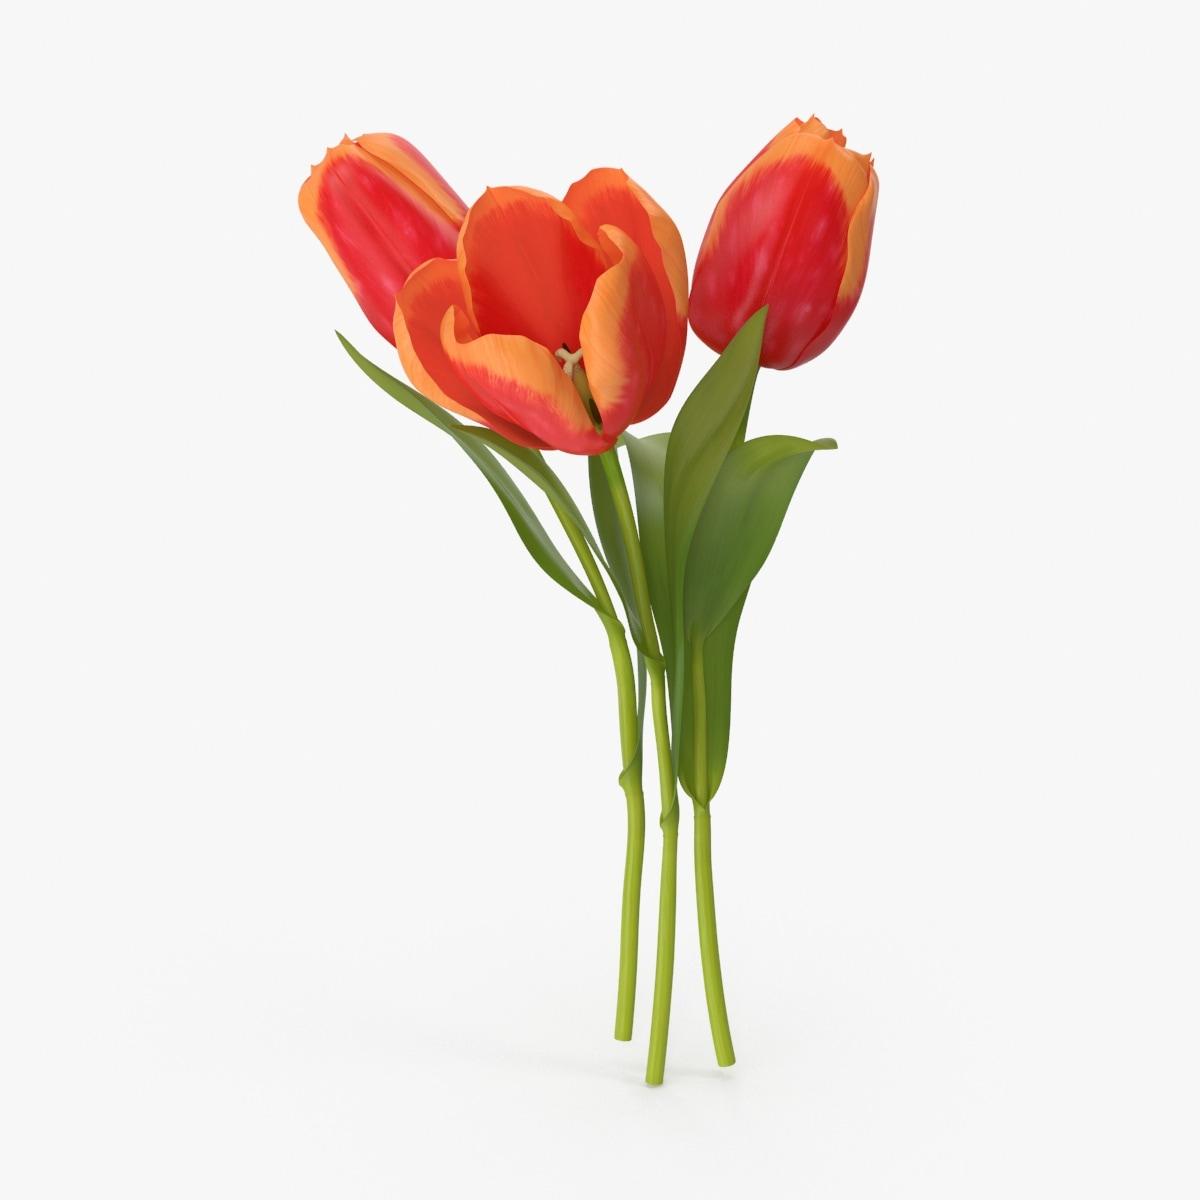 tulips max